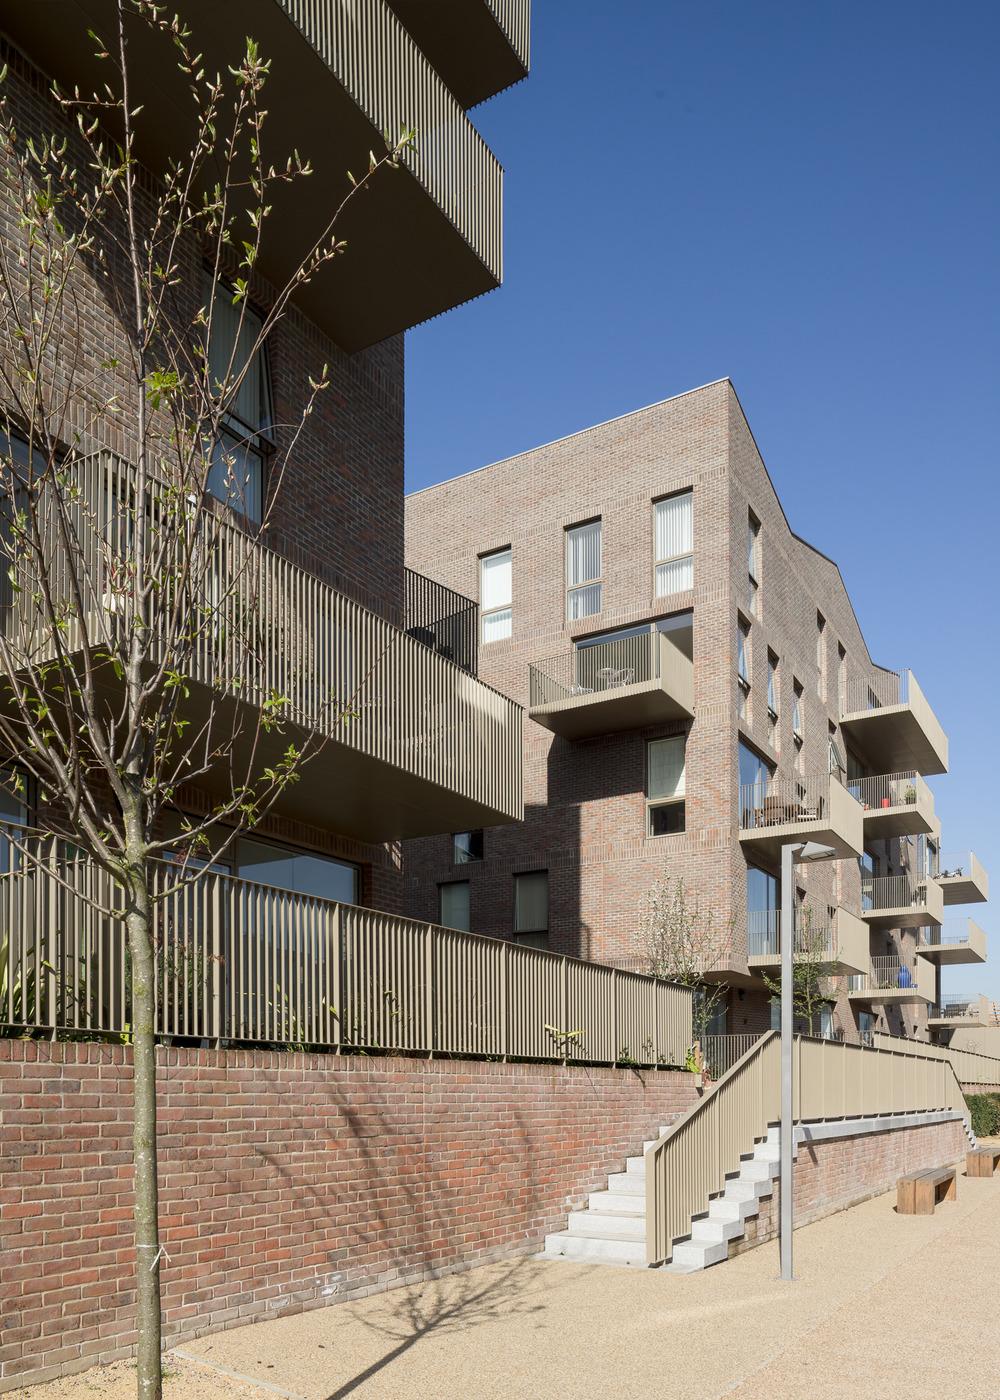 duggan-morris-brenrtford-lock-mark-hadden-amsterdam-architecture-photographer-architectuurfotograaf-041.jpg